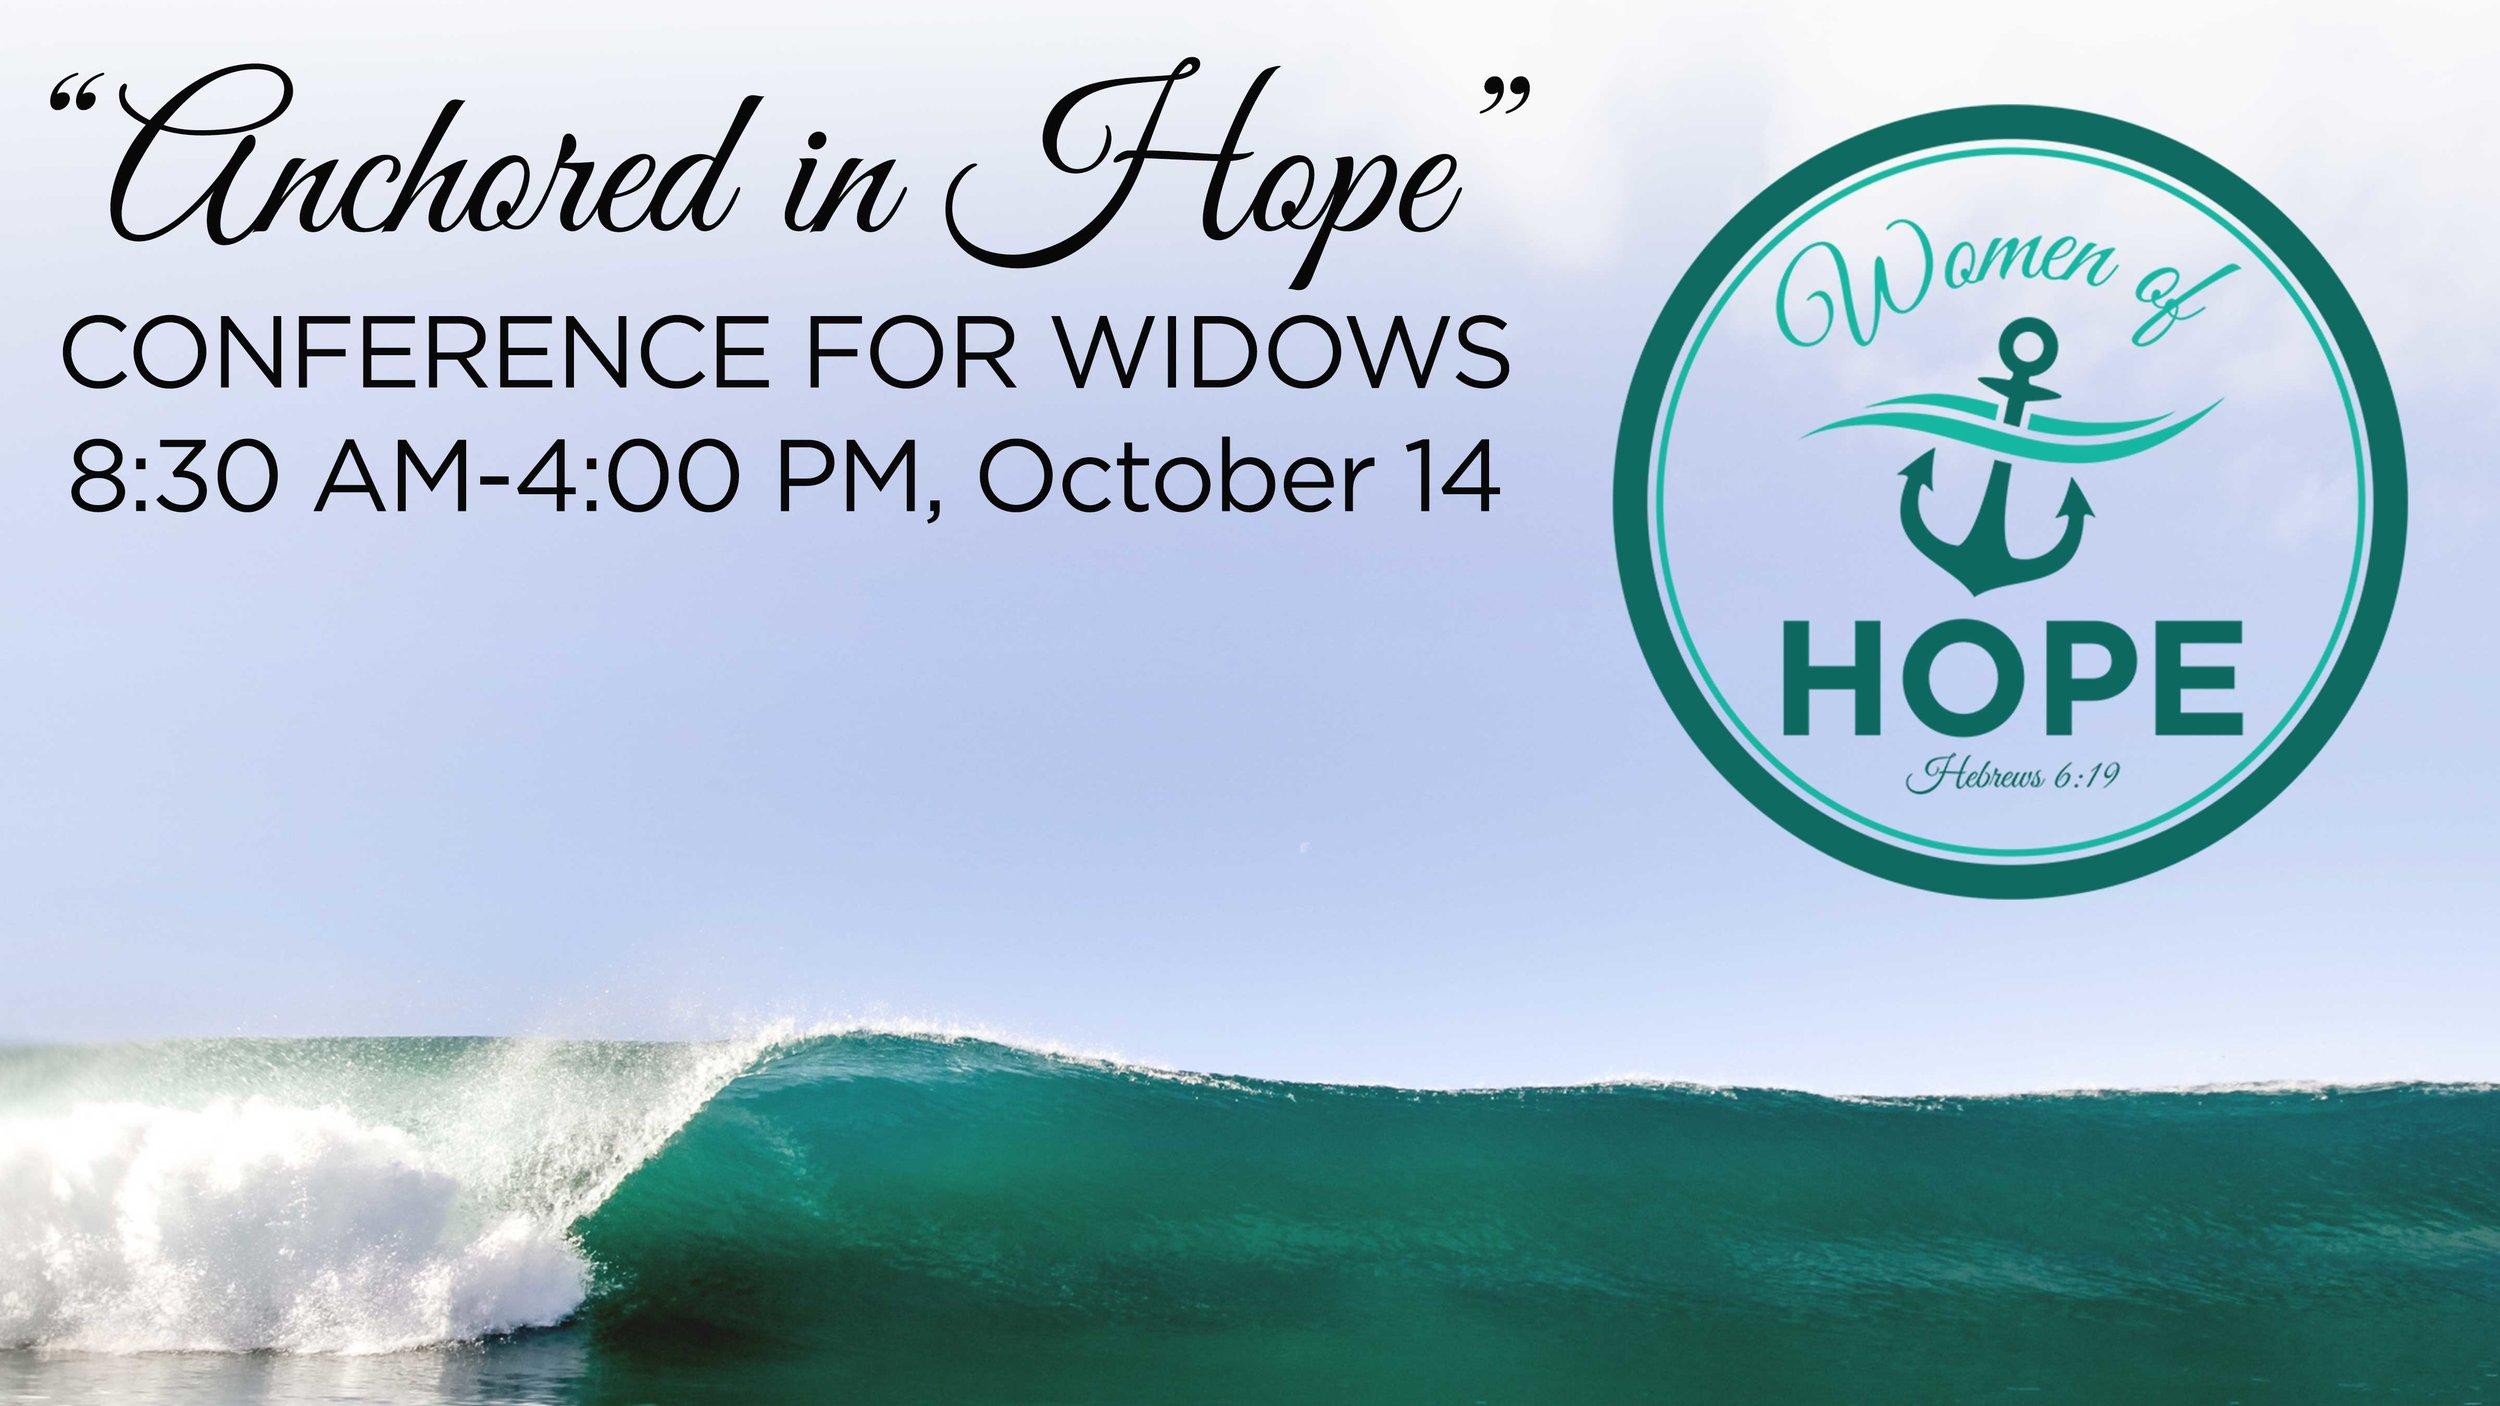 Women-of-Hope-Widows-Conference.jpg